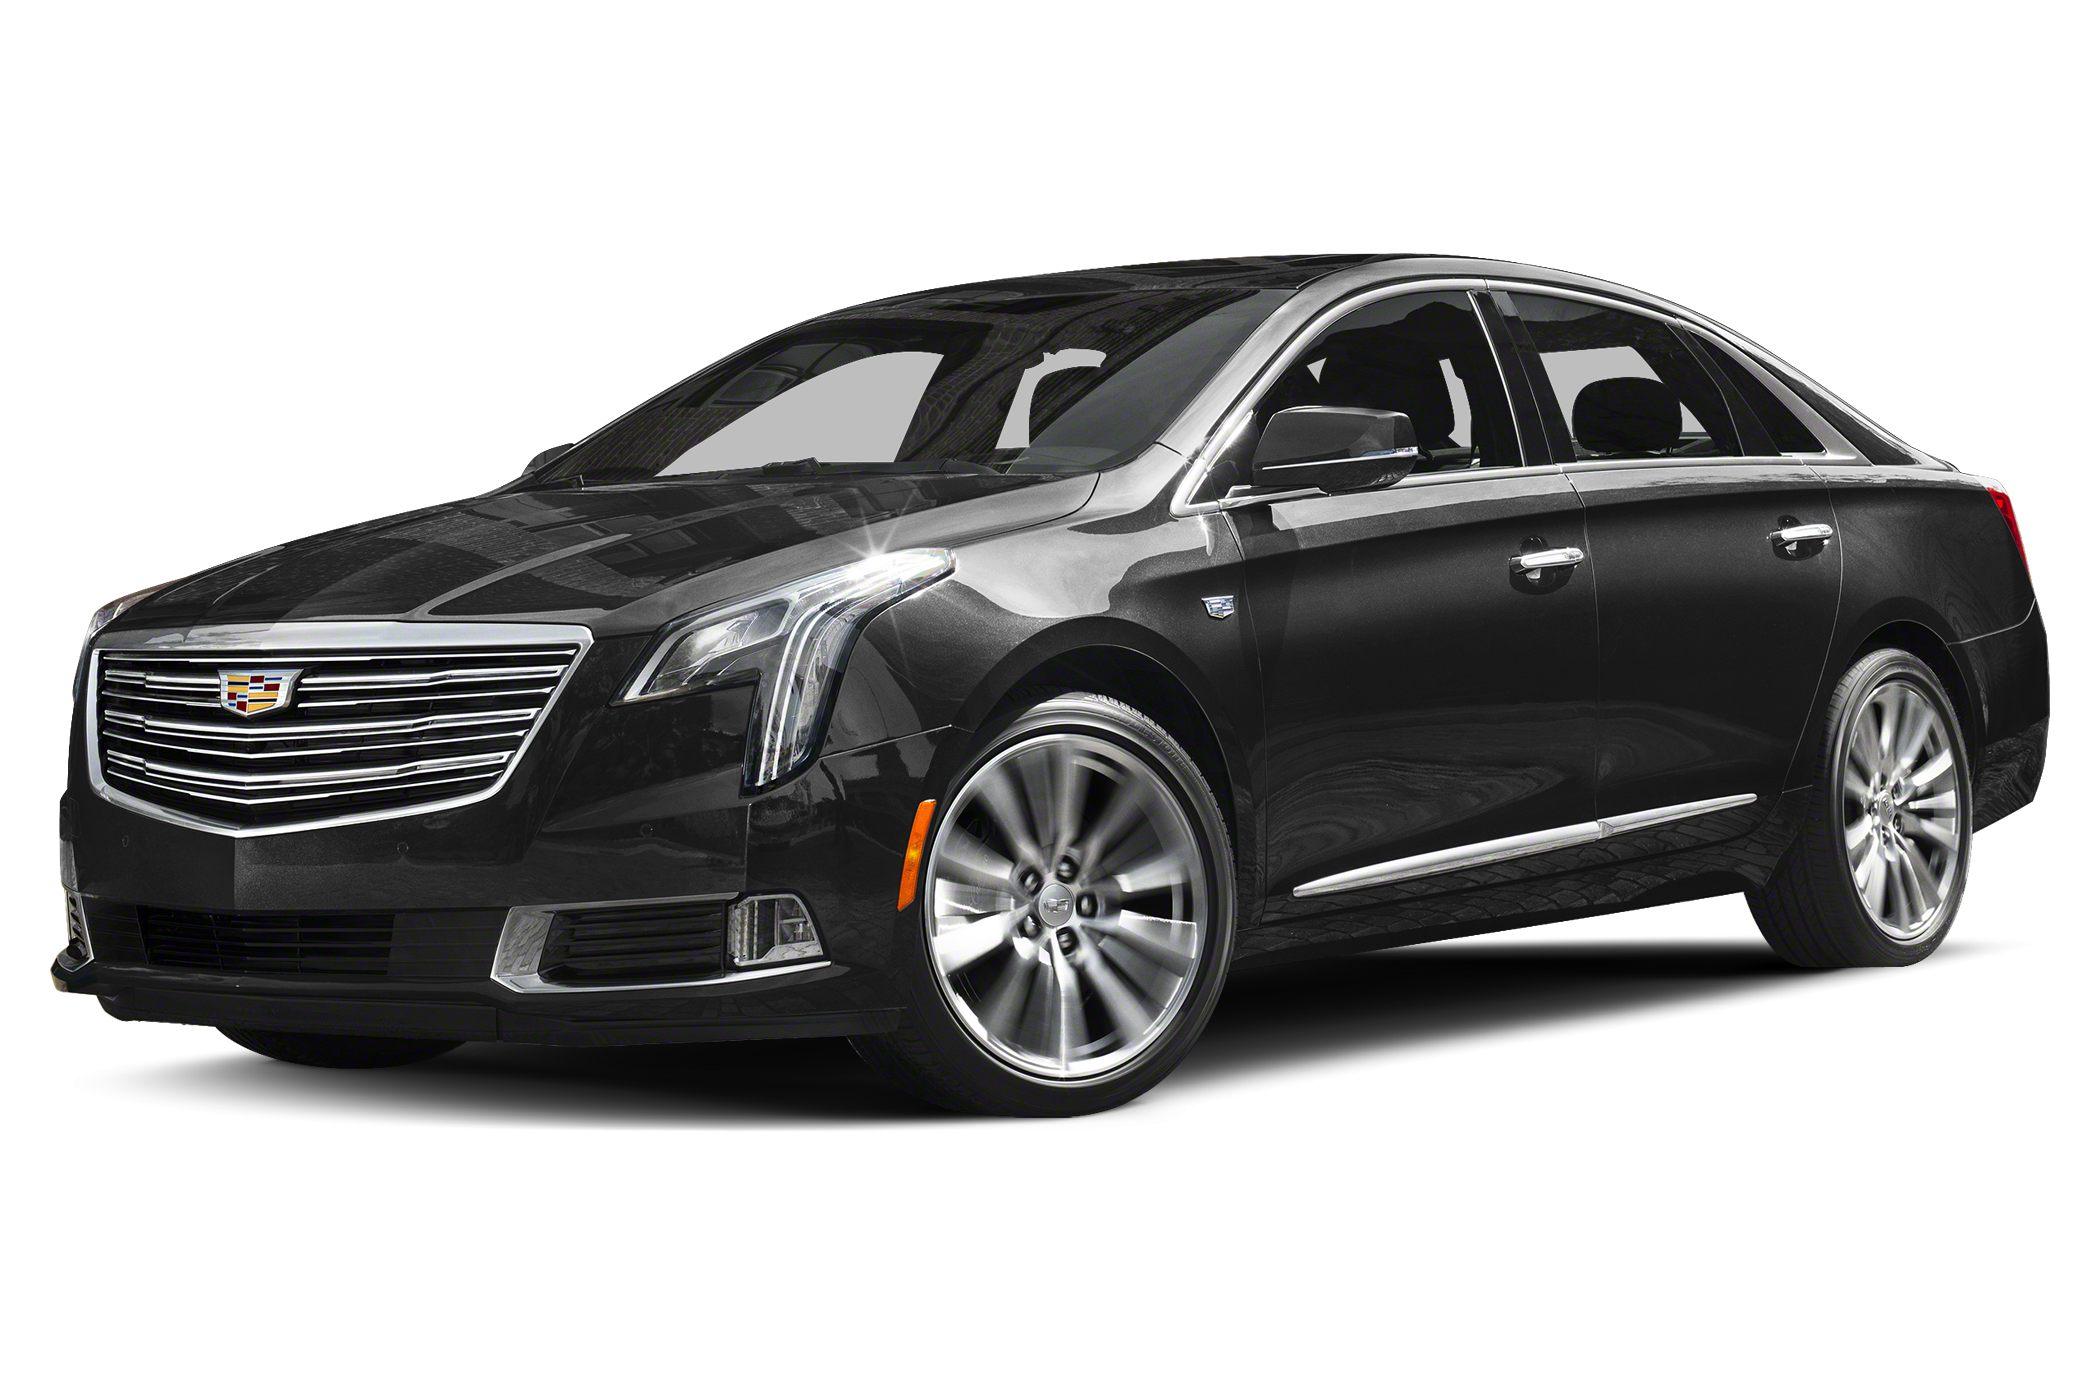 2014 cadillac xts gets 410 hp twin turbo v6 autoblog. Black Bedroom Furniture Sets. Home Design Ideas